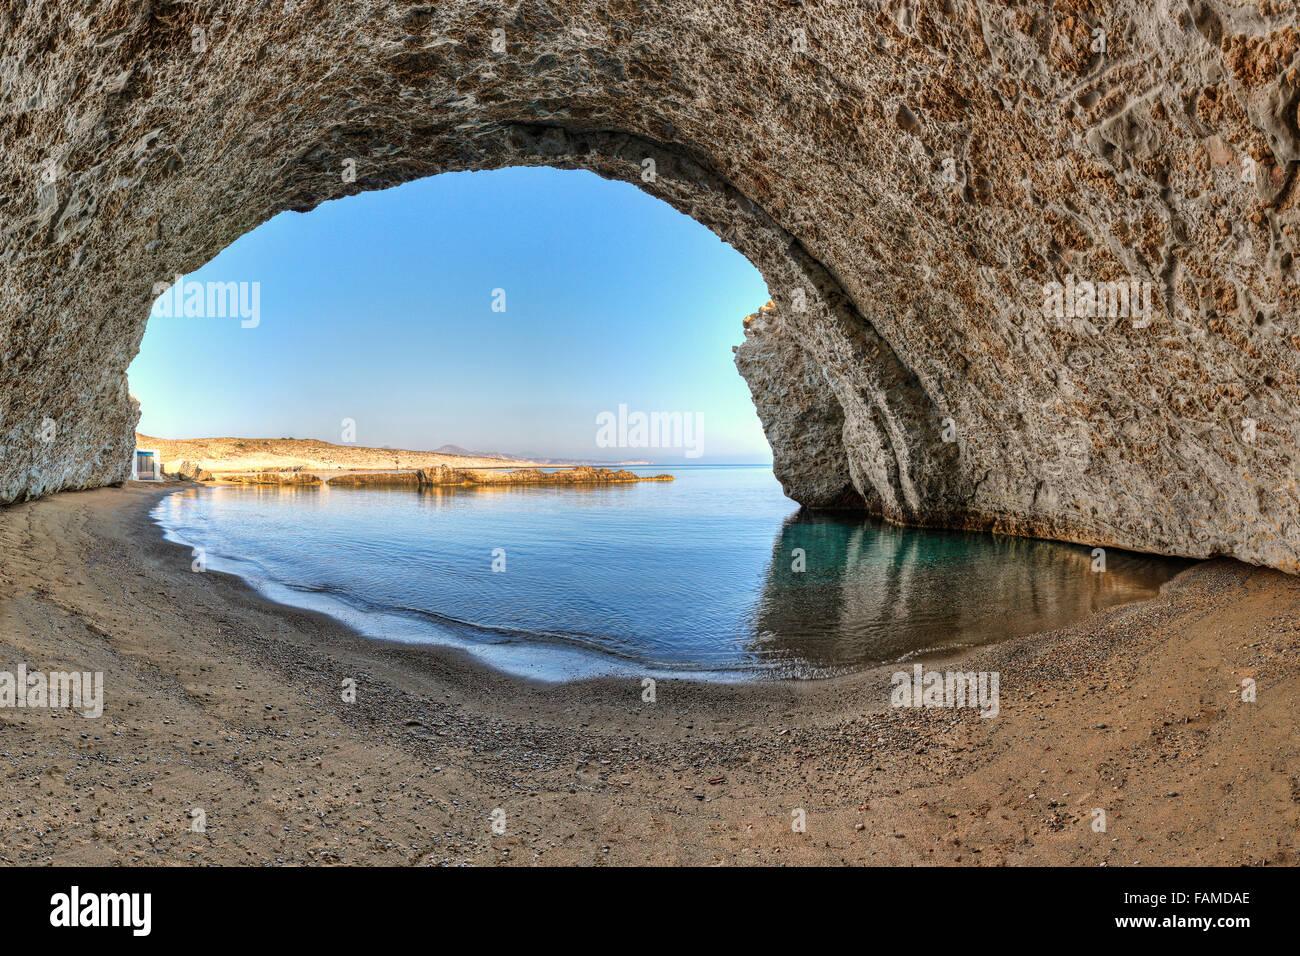 The beach Alogomandra inside a cave in Milos, Greece - Stock Image